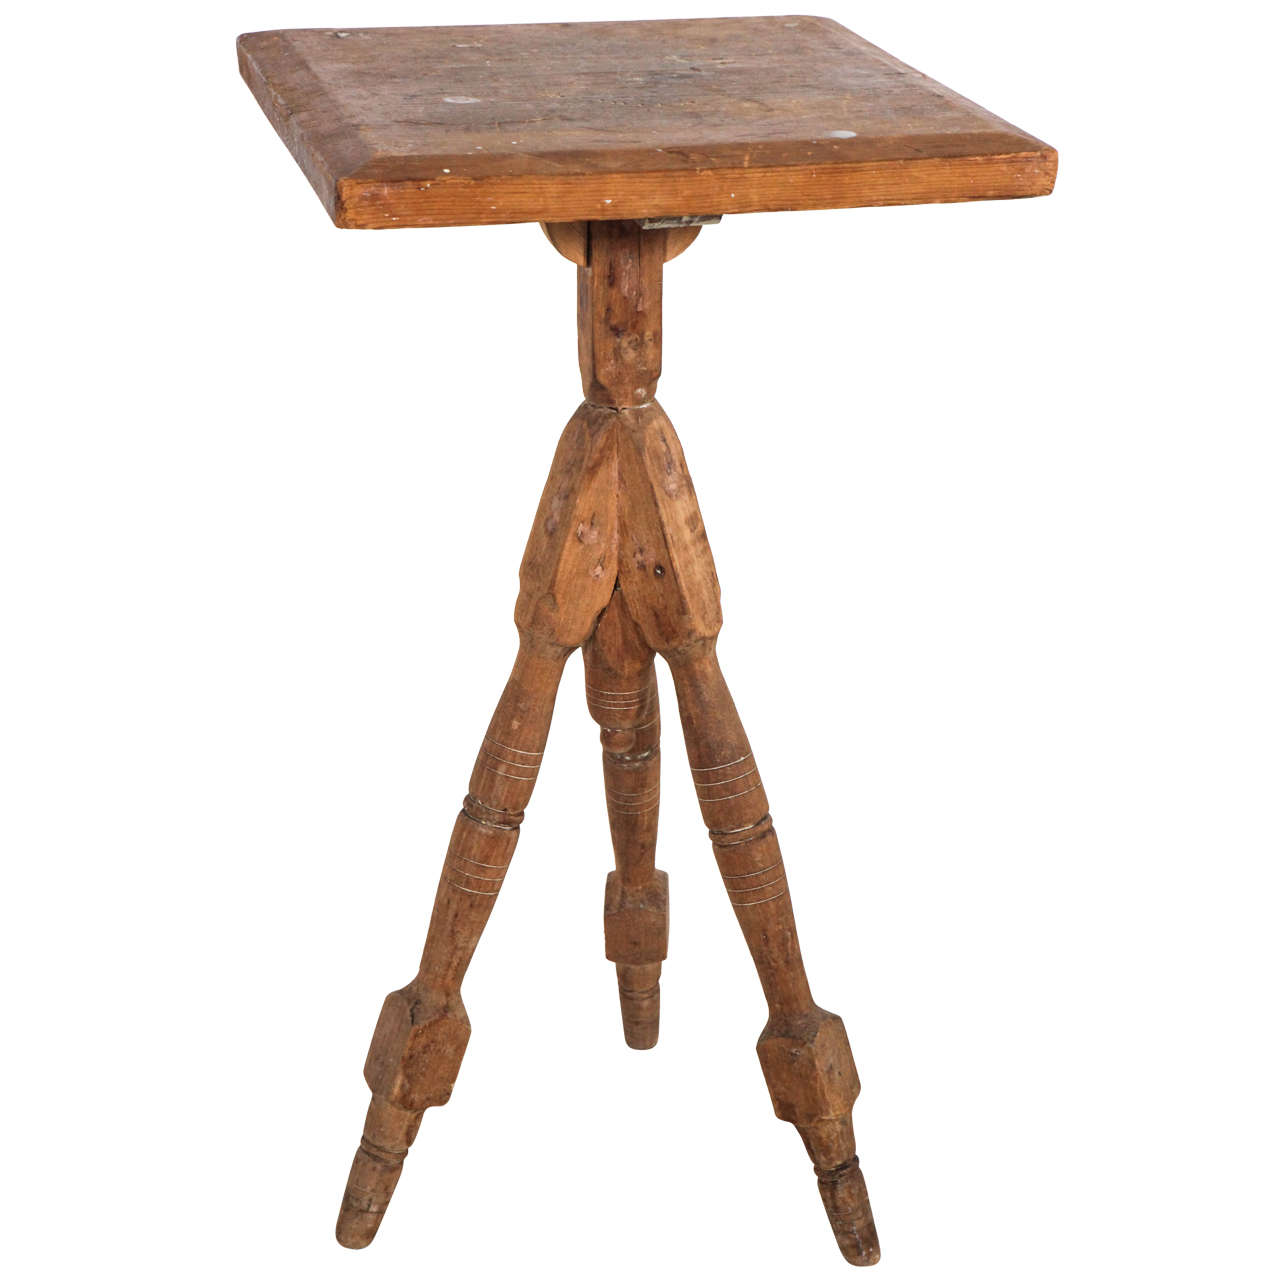 Vintage wood tripod spindle leg side table at stdibs